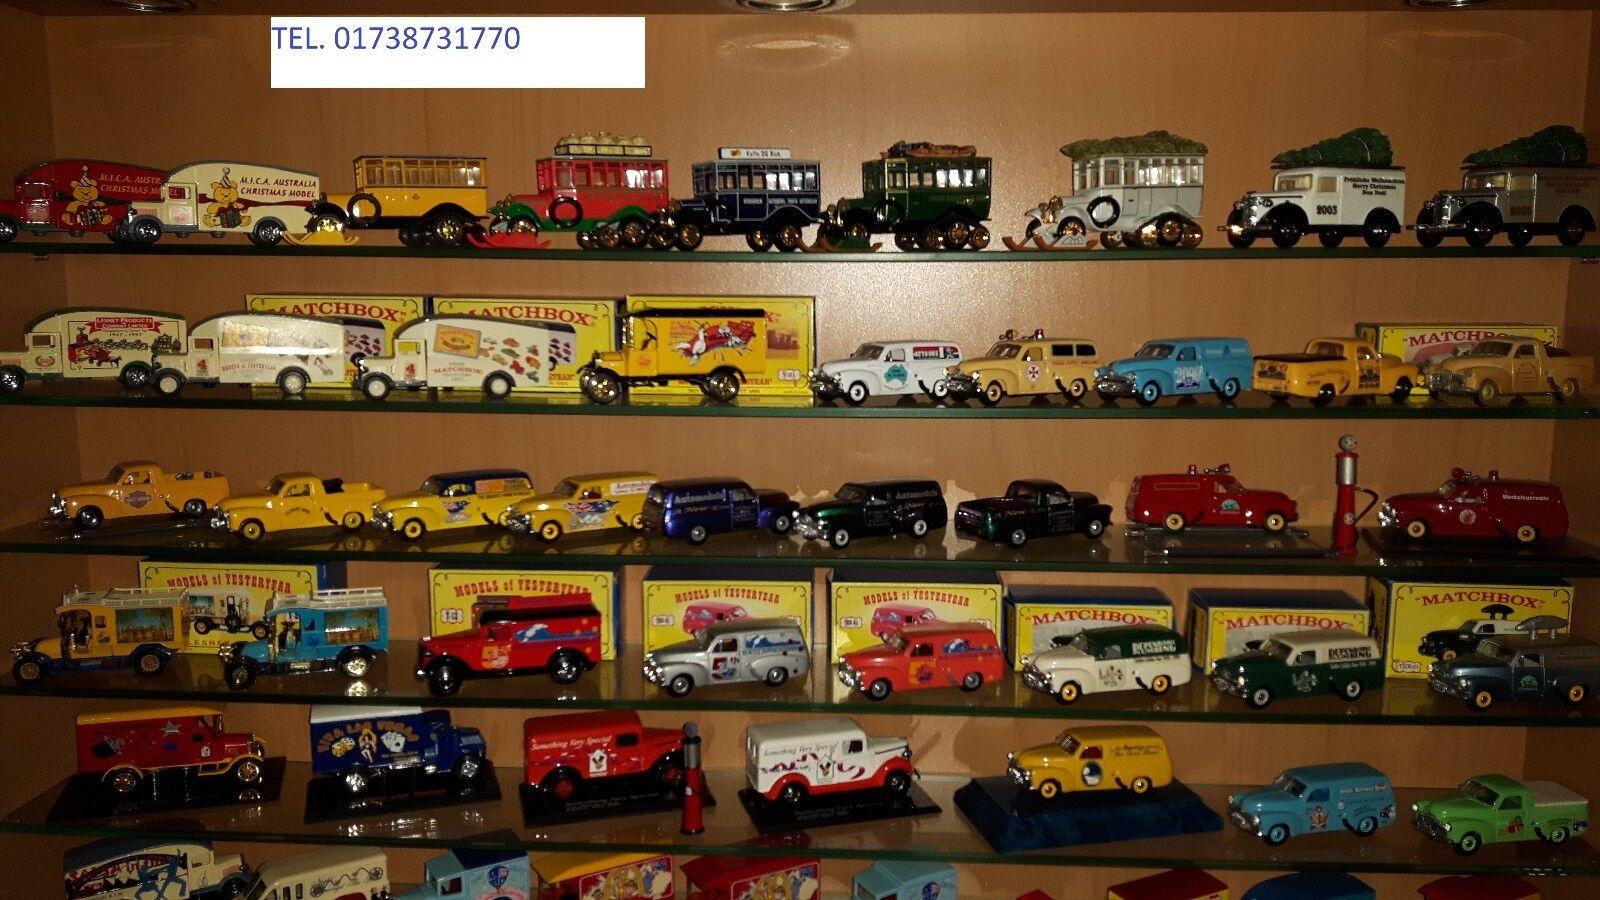 Matchbox PRO HART Australian Australian Australian Art Set Ford TT  Nr. 17 / 1000 Jenny KEE YY-21 | Nous Avons Gagné Les éloges De Clients  5c767b